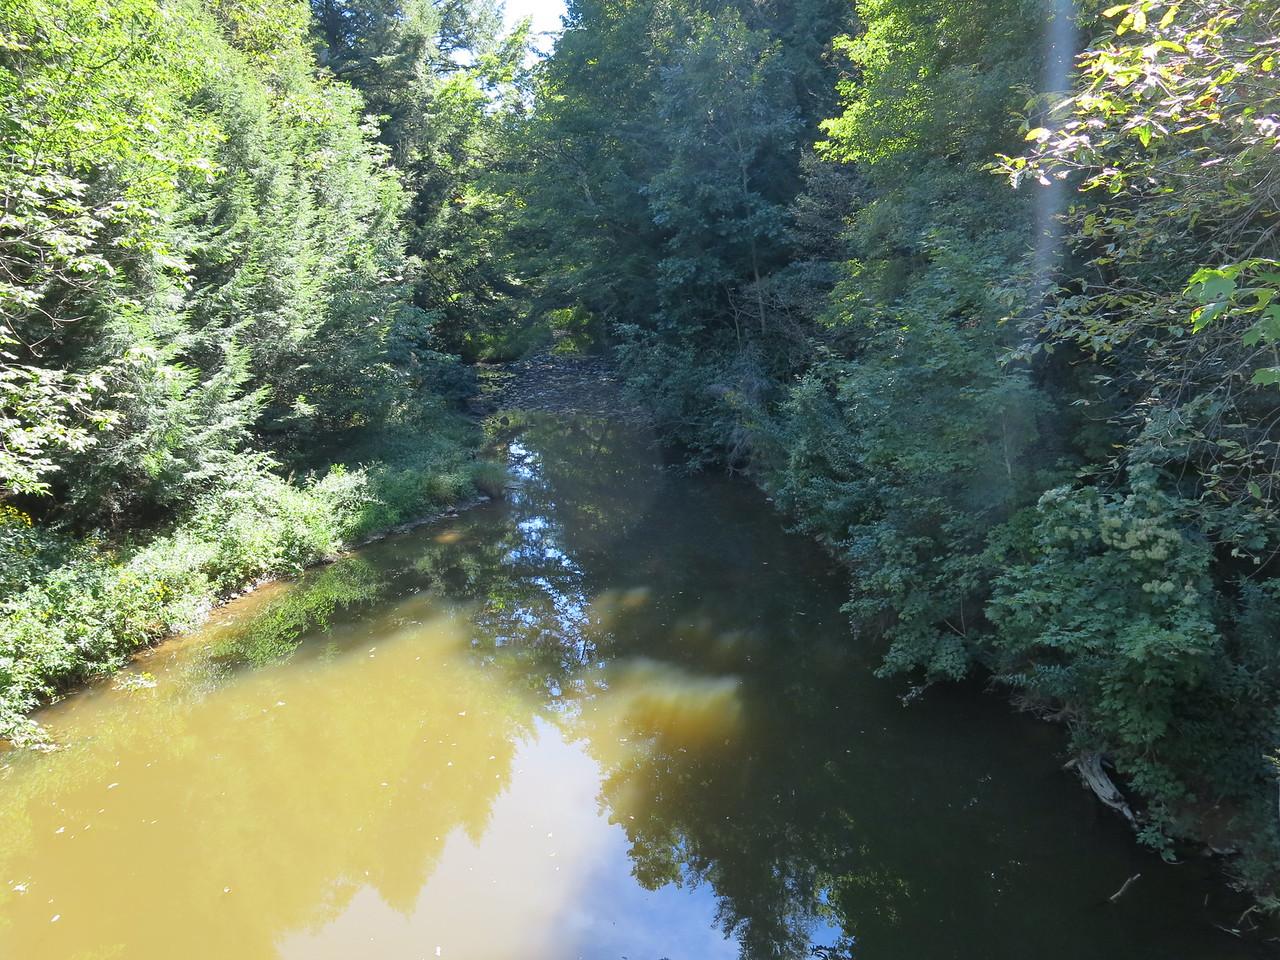 Nondescript creek beneath a bridge